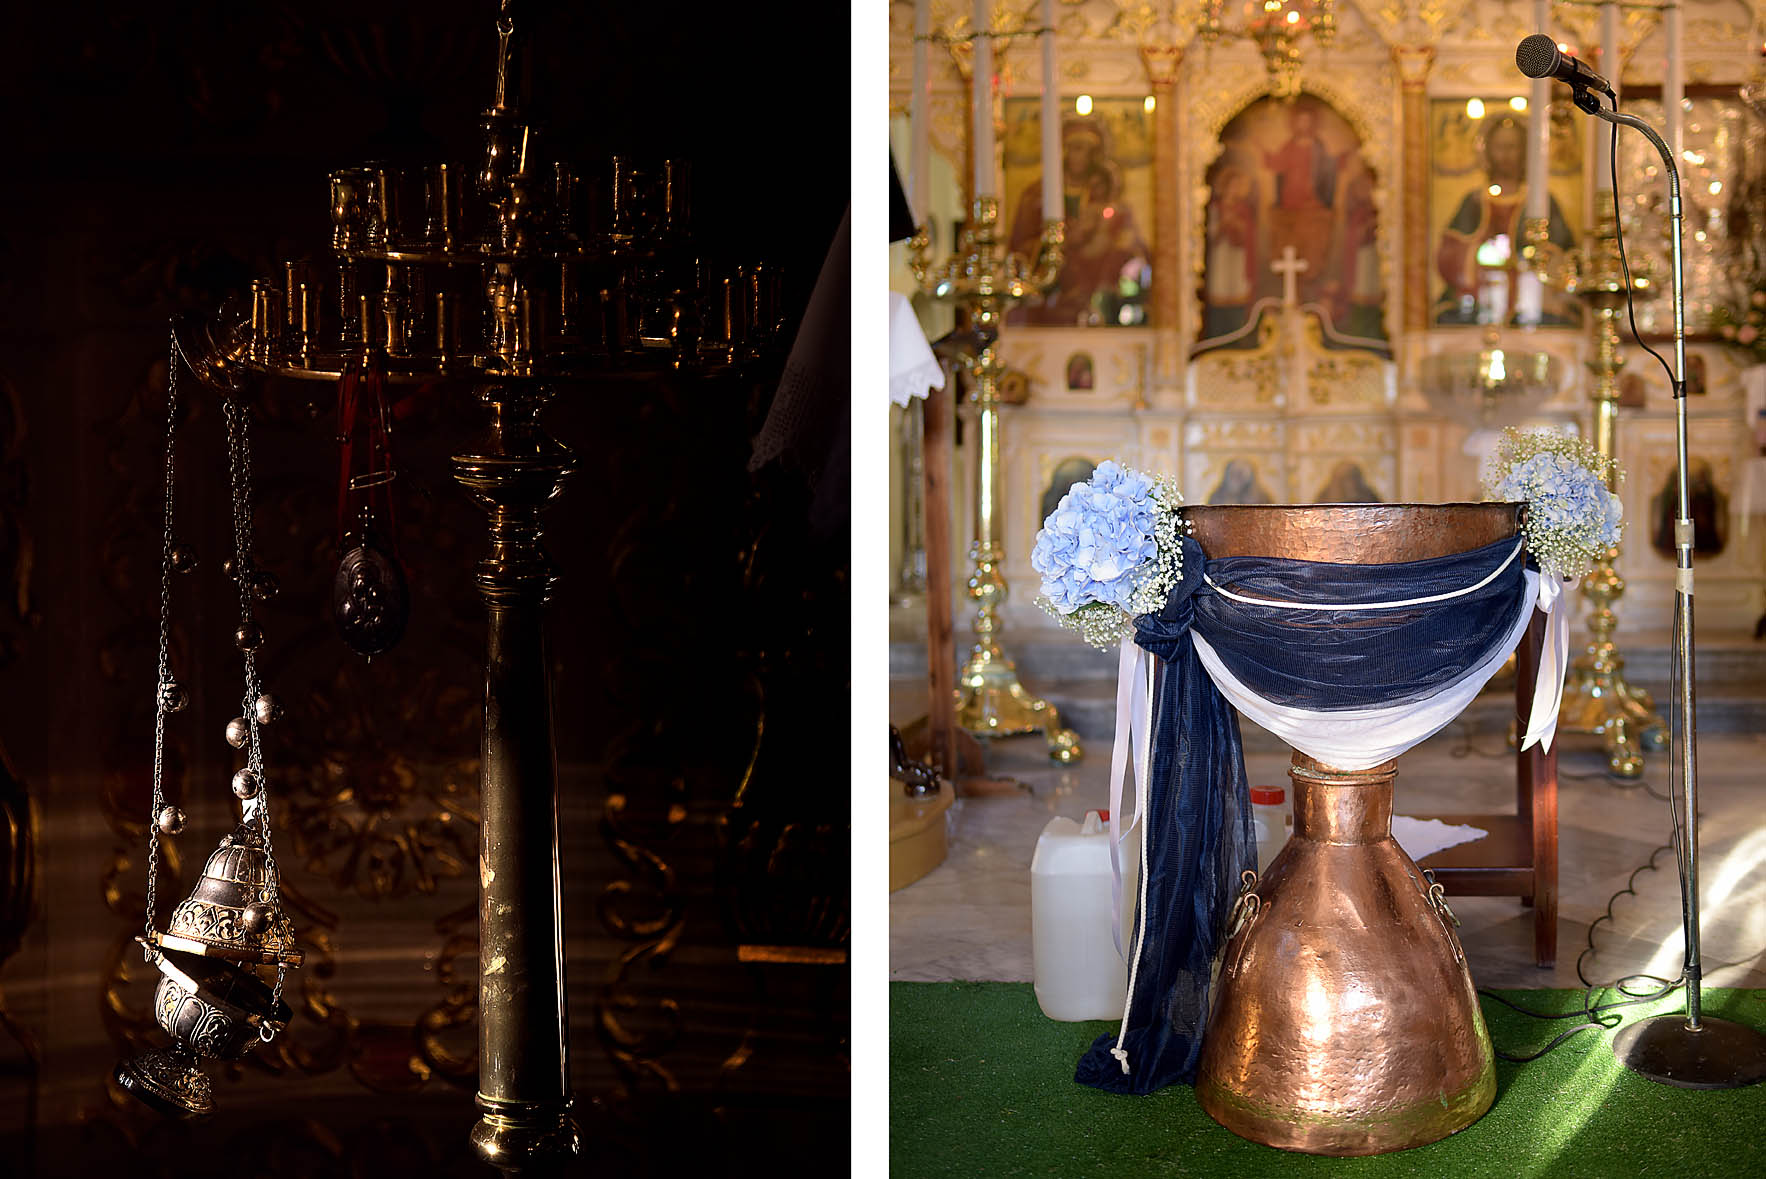 panagia-siriotissa-kampos-chios-christening-baptism-alexis-koumaditis-photography-details-01